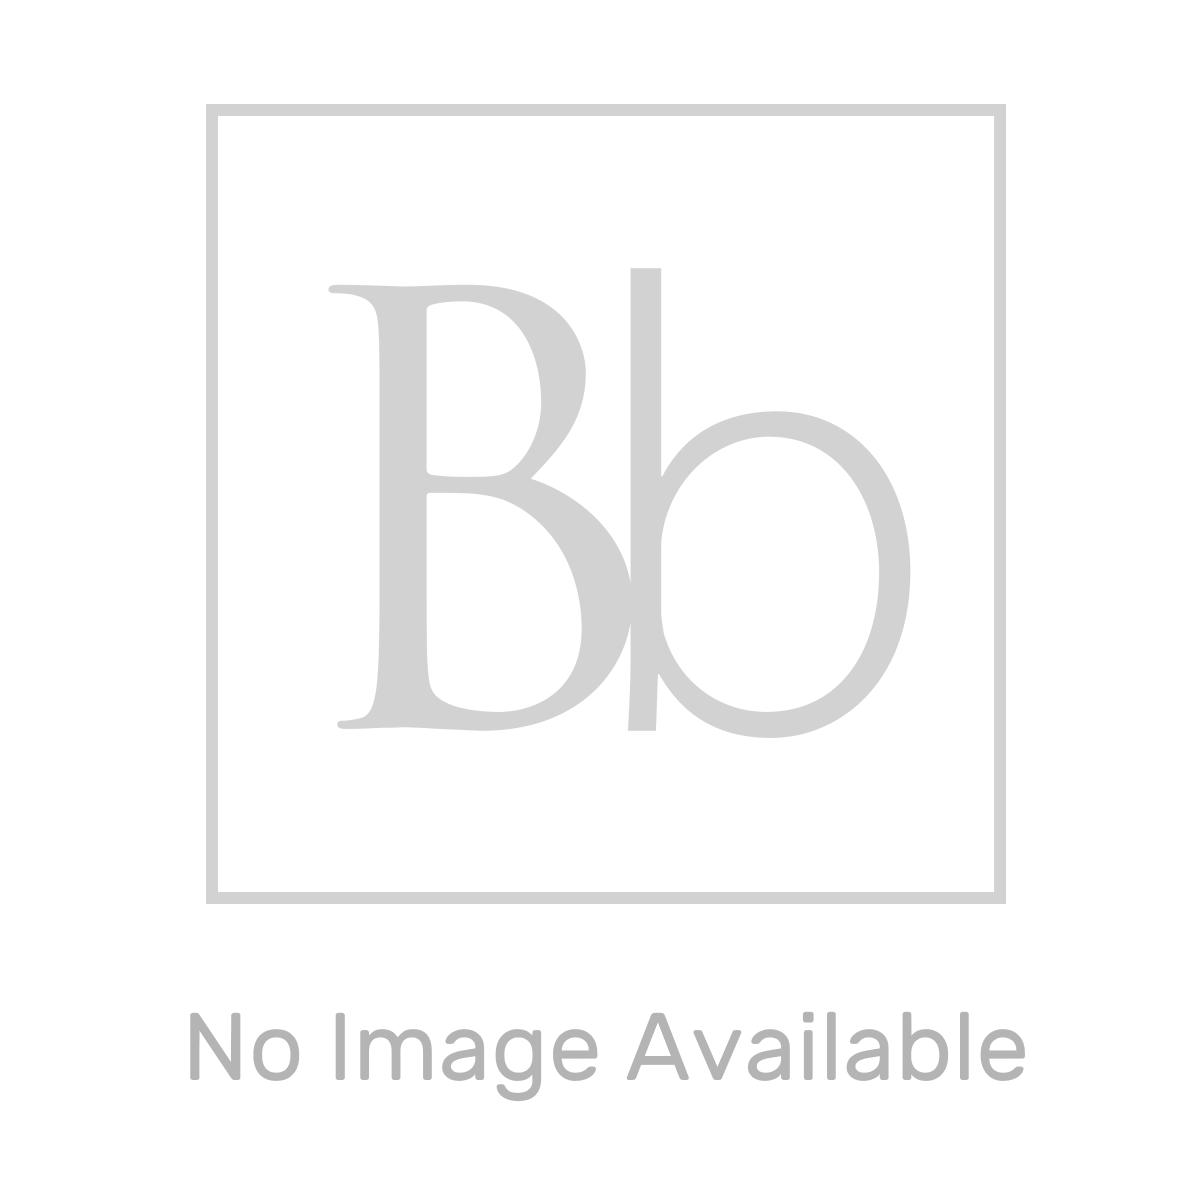 RAK Moon Wall Hung Hidden Fixation WC Pan with Soft Close Seat